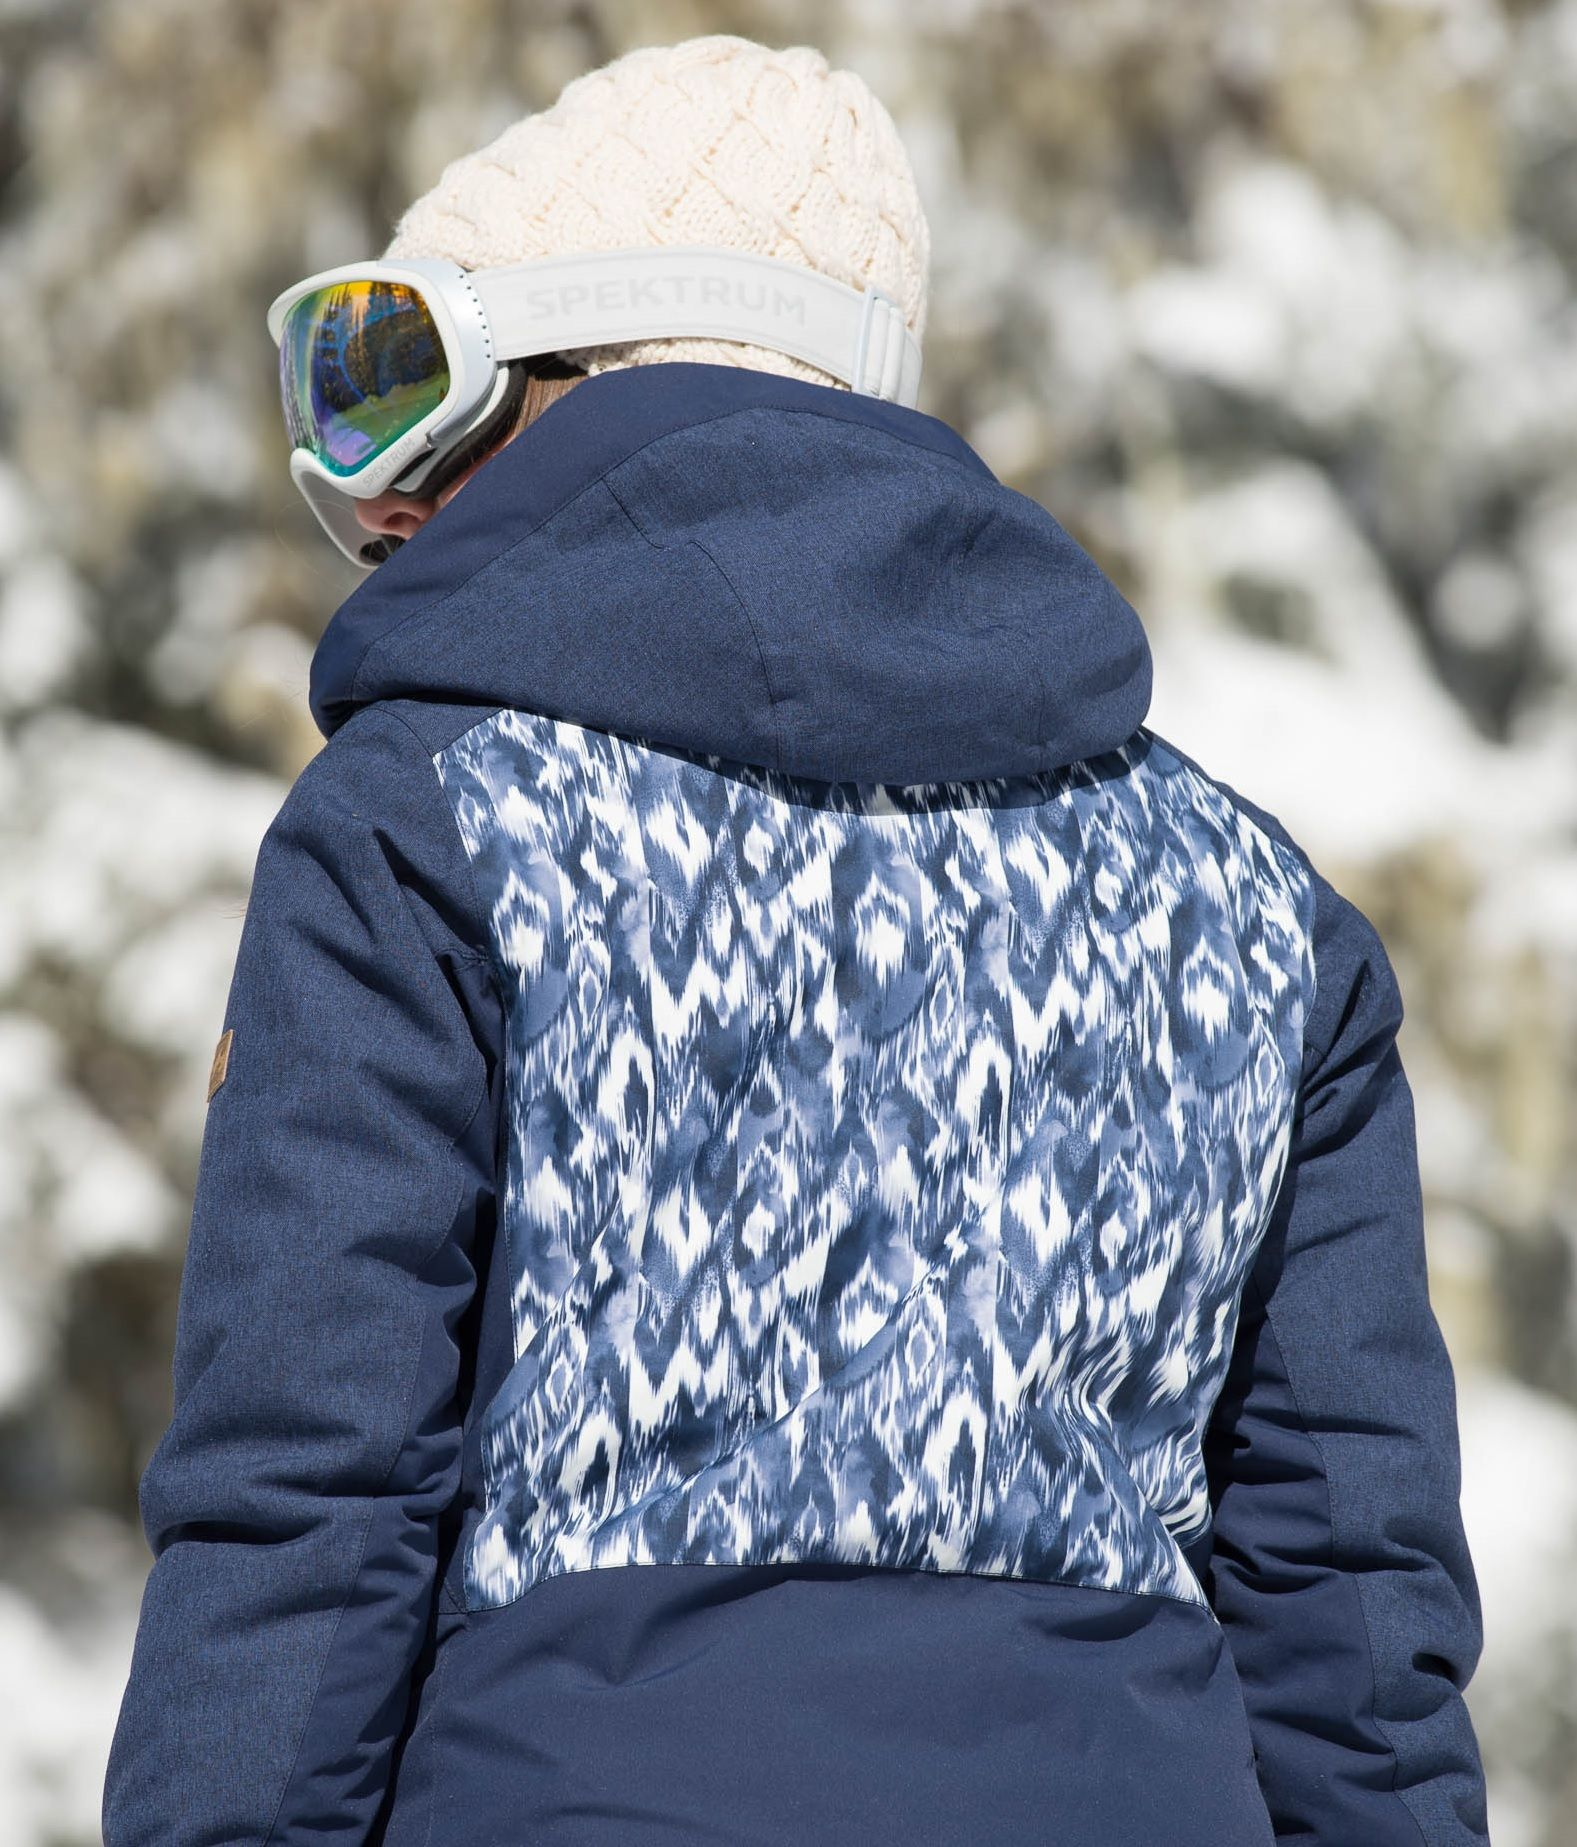 Anything But Boring Bluetomato Billabong Snowstyle Snowwear Snowboarding Skiing Jacket Womenswear Backpri Snowboarding Outfit Blue Tomato Online Blue